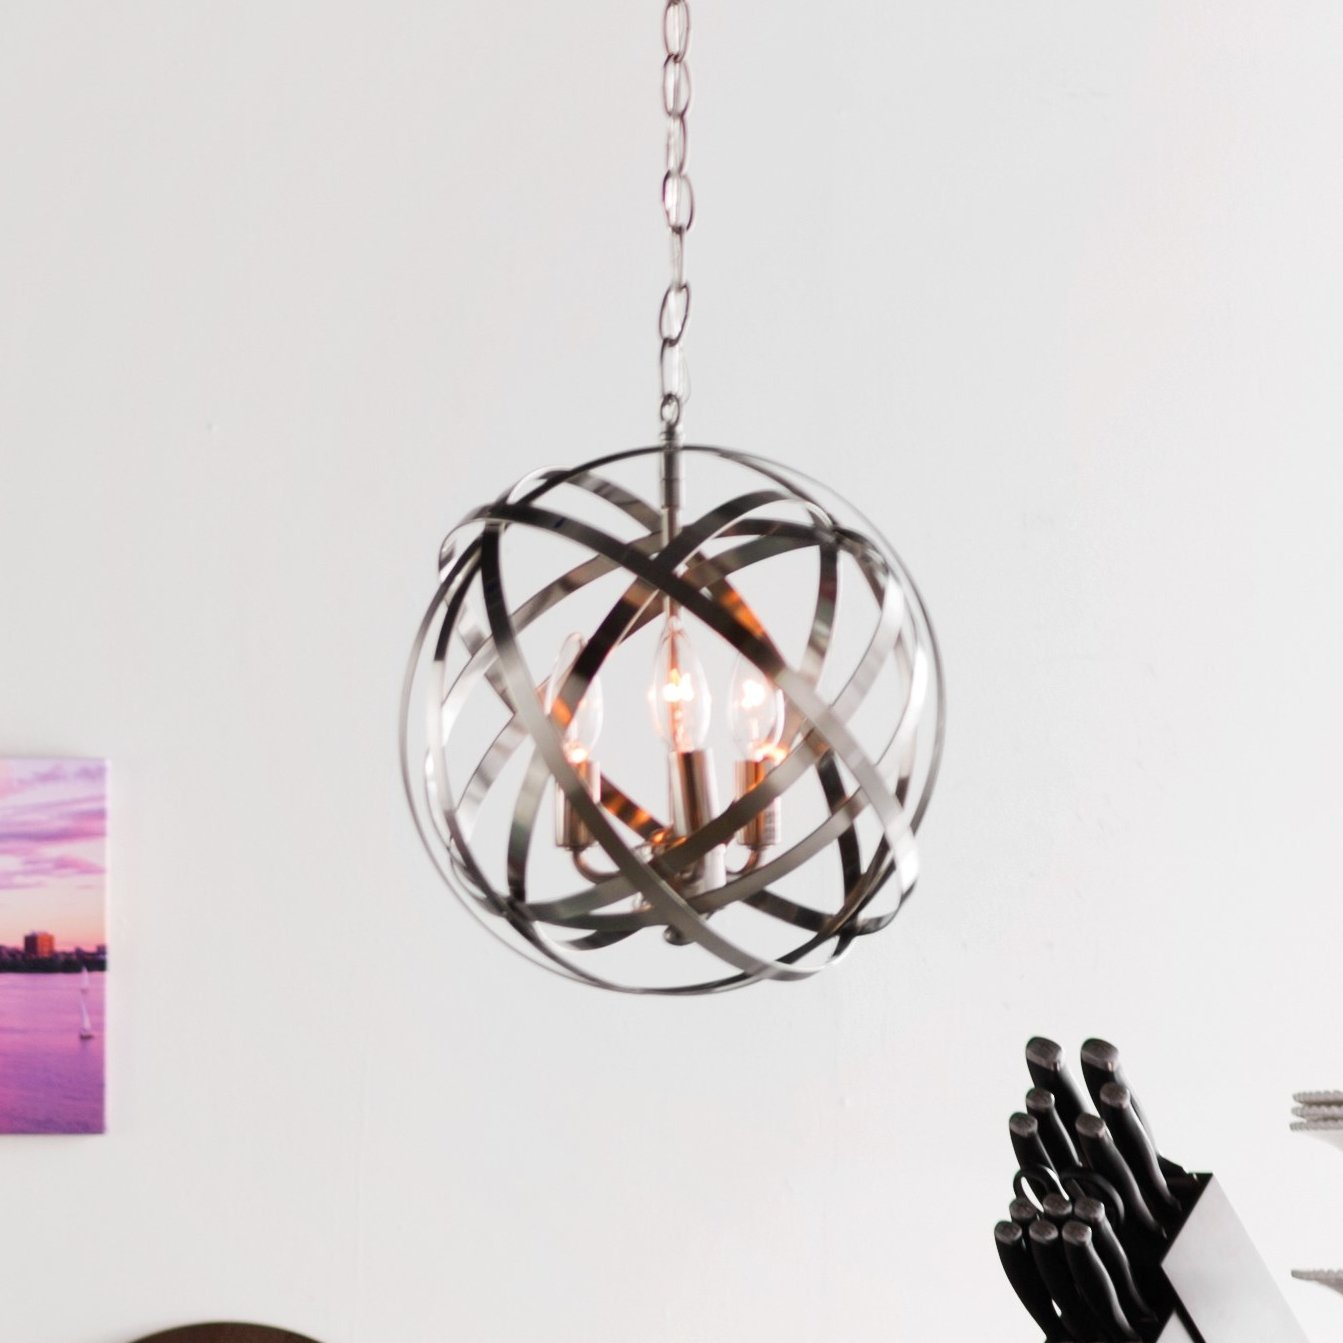 Adcock 3 Light Single Globe Pendant For Dirksen 3 Light Single Cylinder Chandeliers (View 9 of 30)